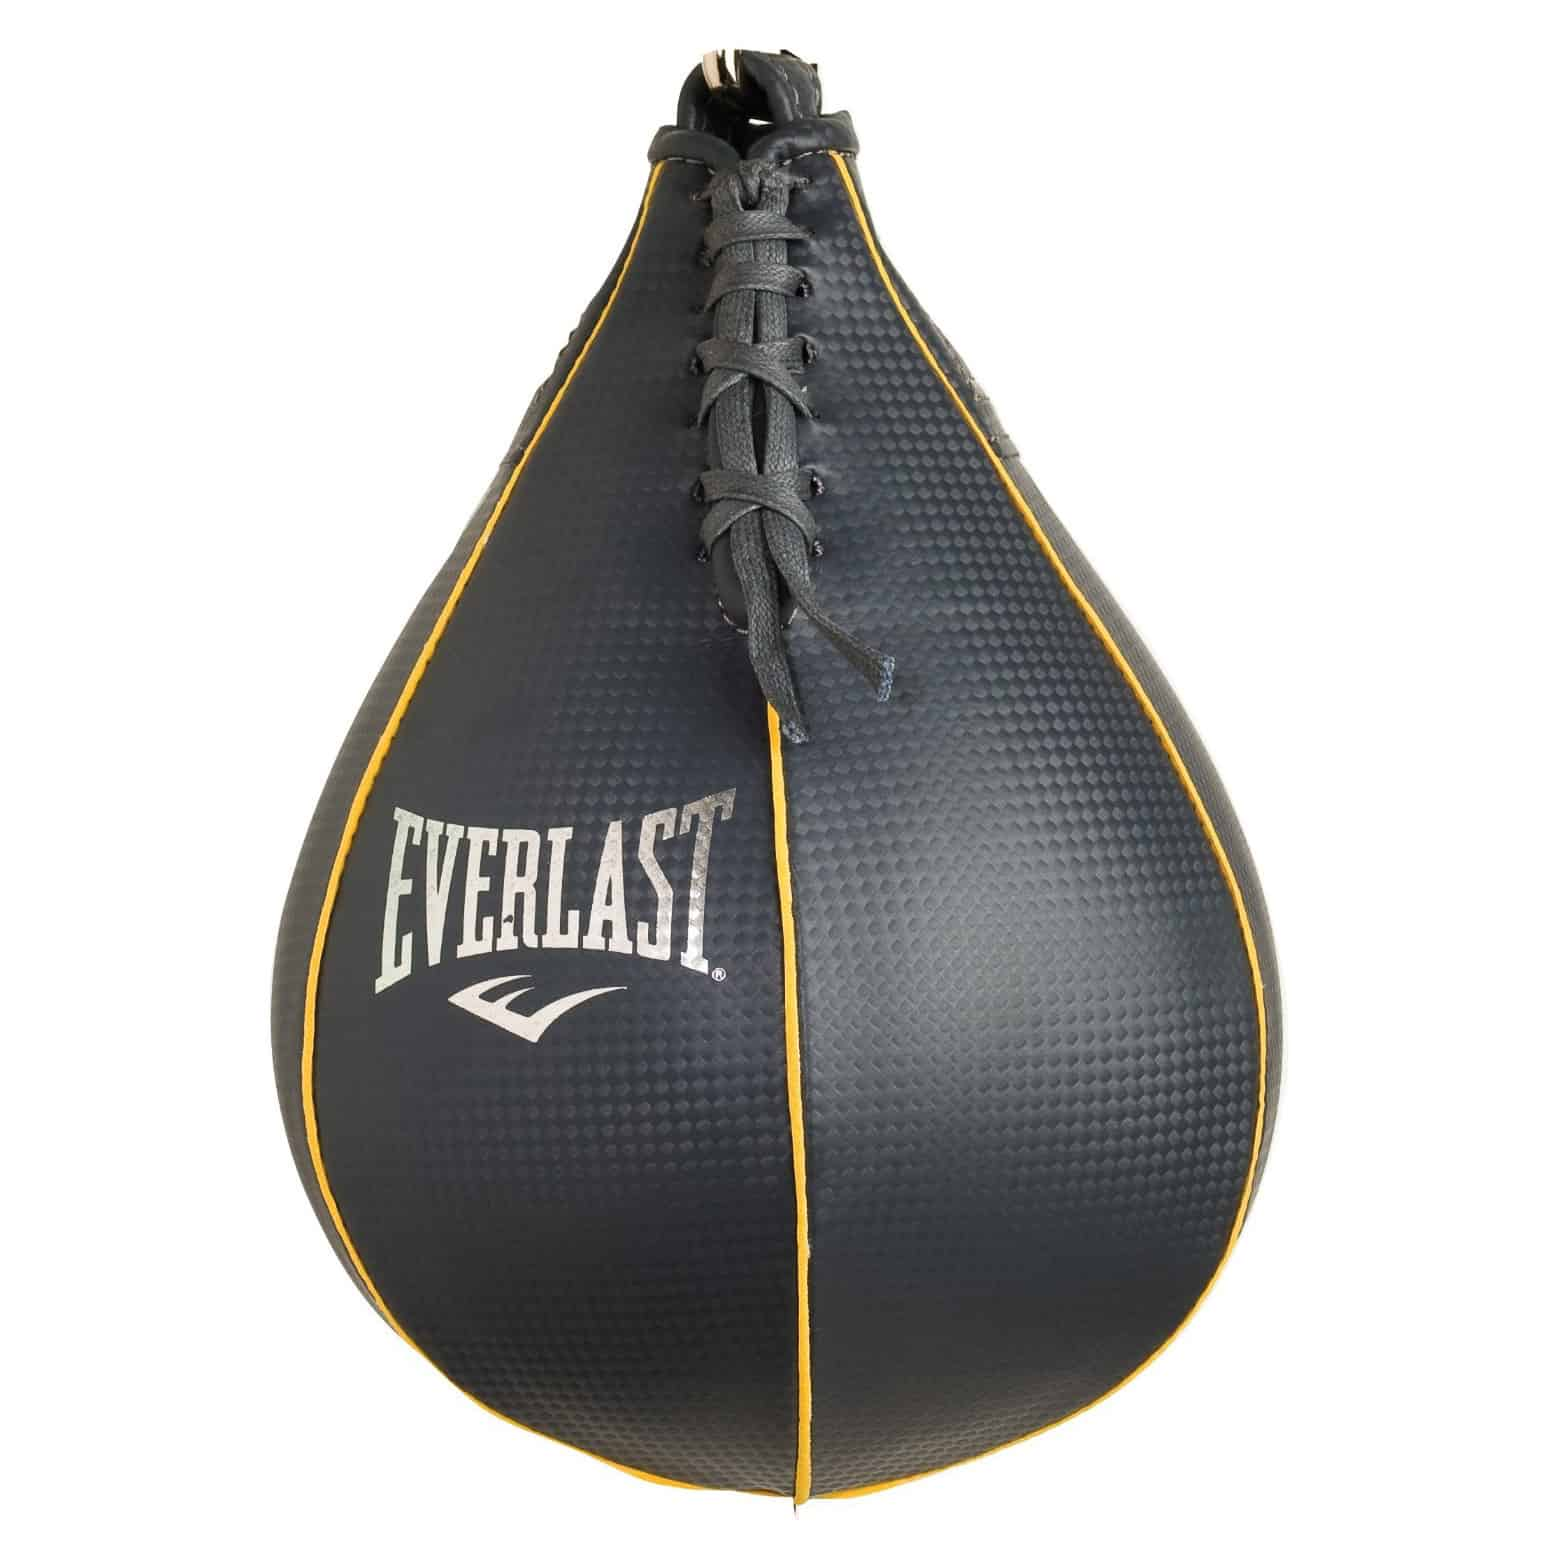 best speed bags ko boxing gloves